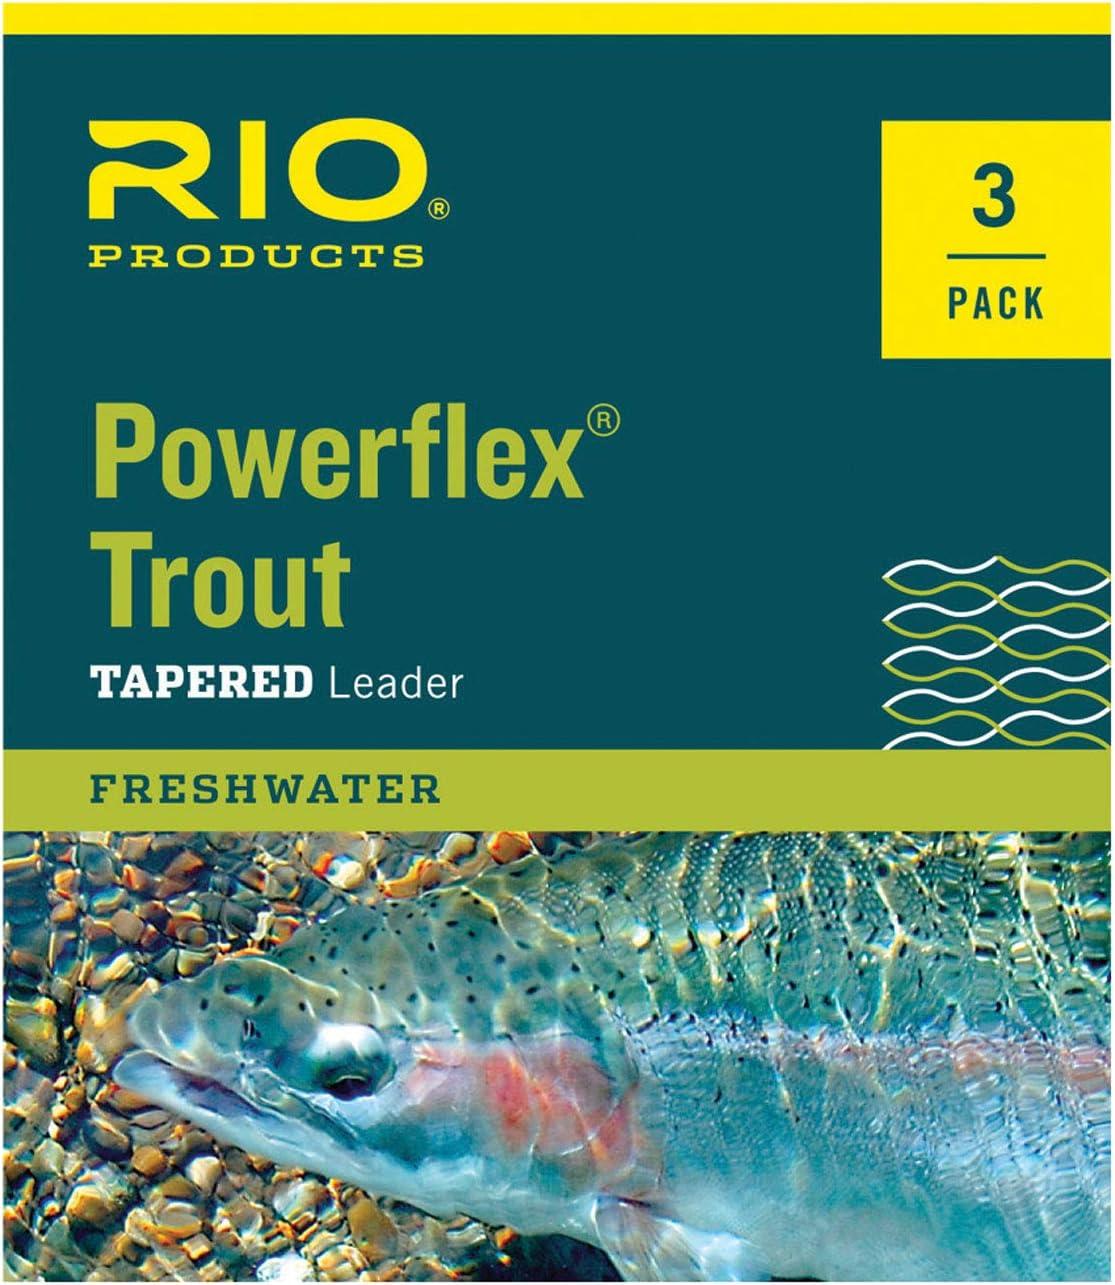 9ft 3 Pack Rio Fishing Products Fluoroflex Steelhead//Salmon Fluorocarbon Leader